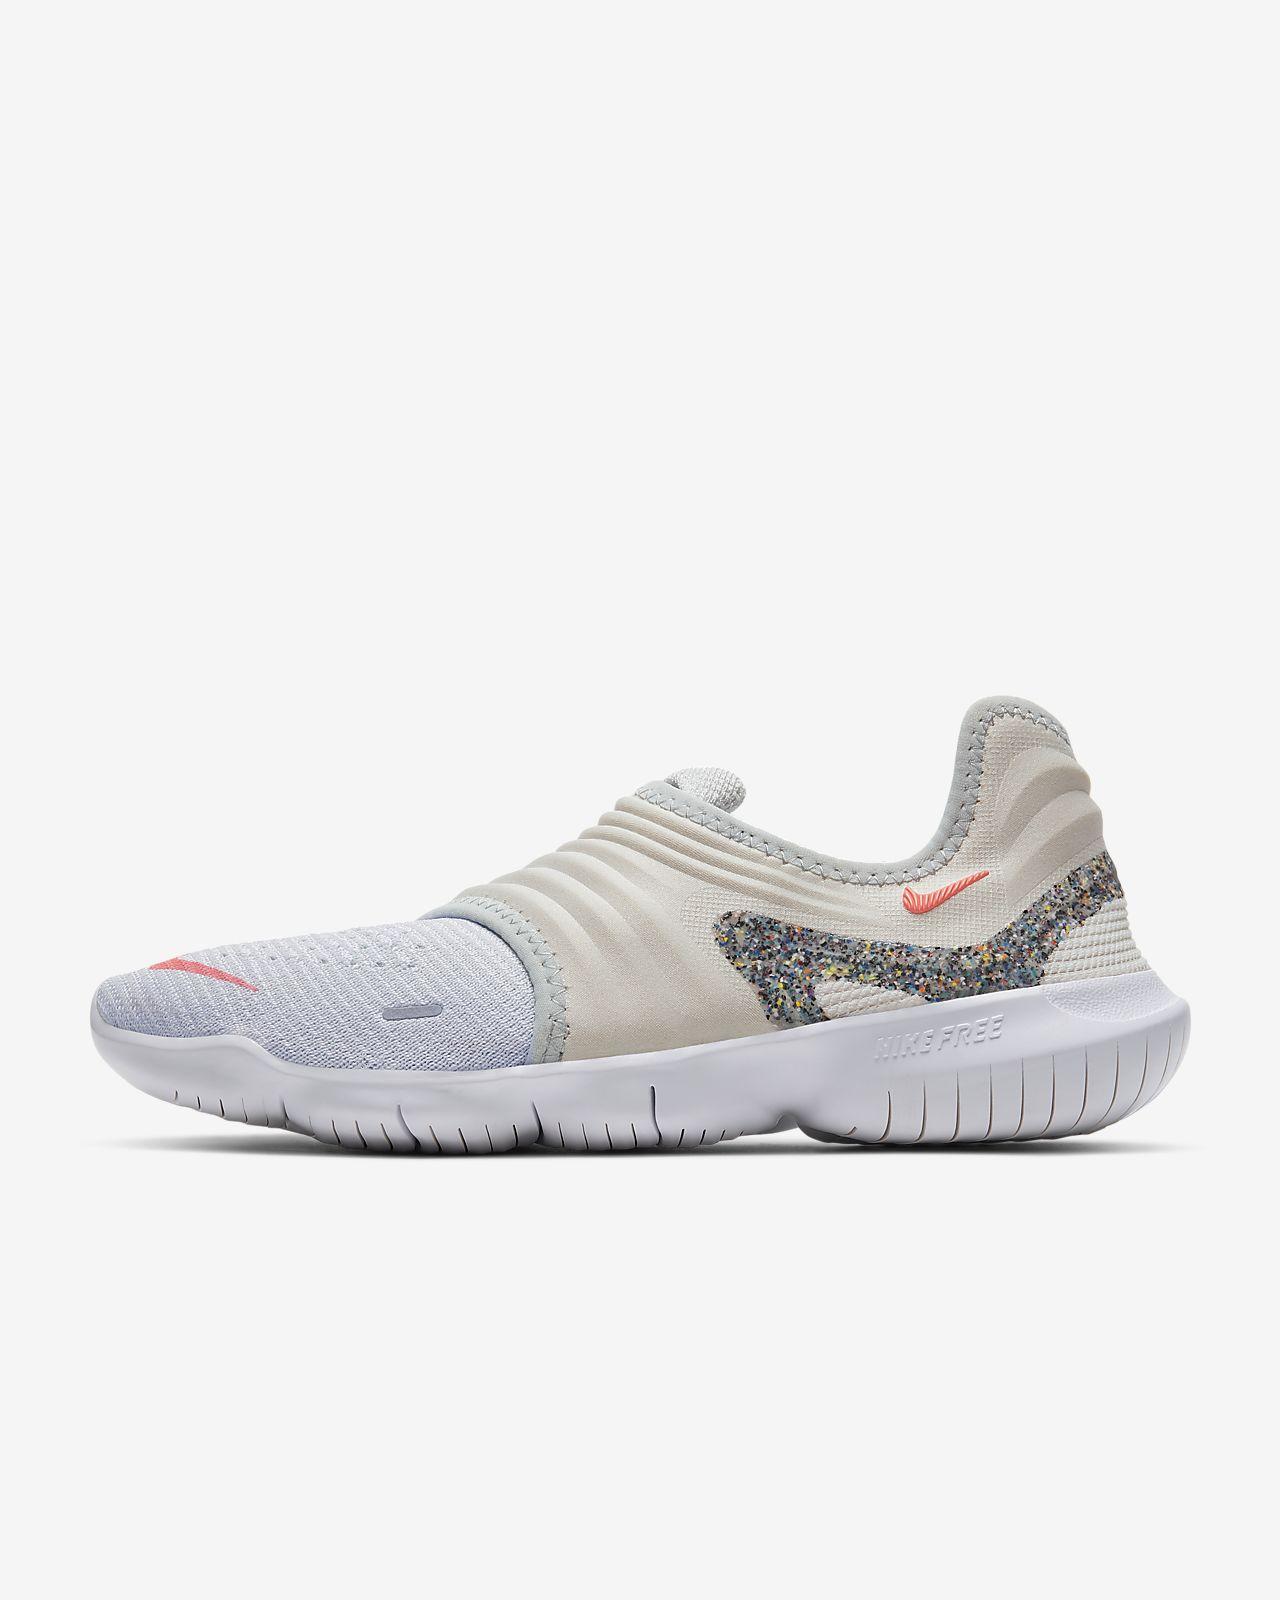 Nike Free RN Flyknit 3.0 AW 女子跑步鞋